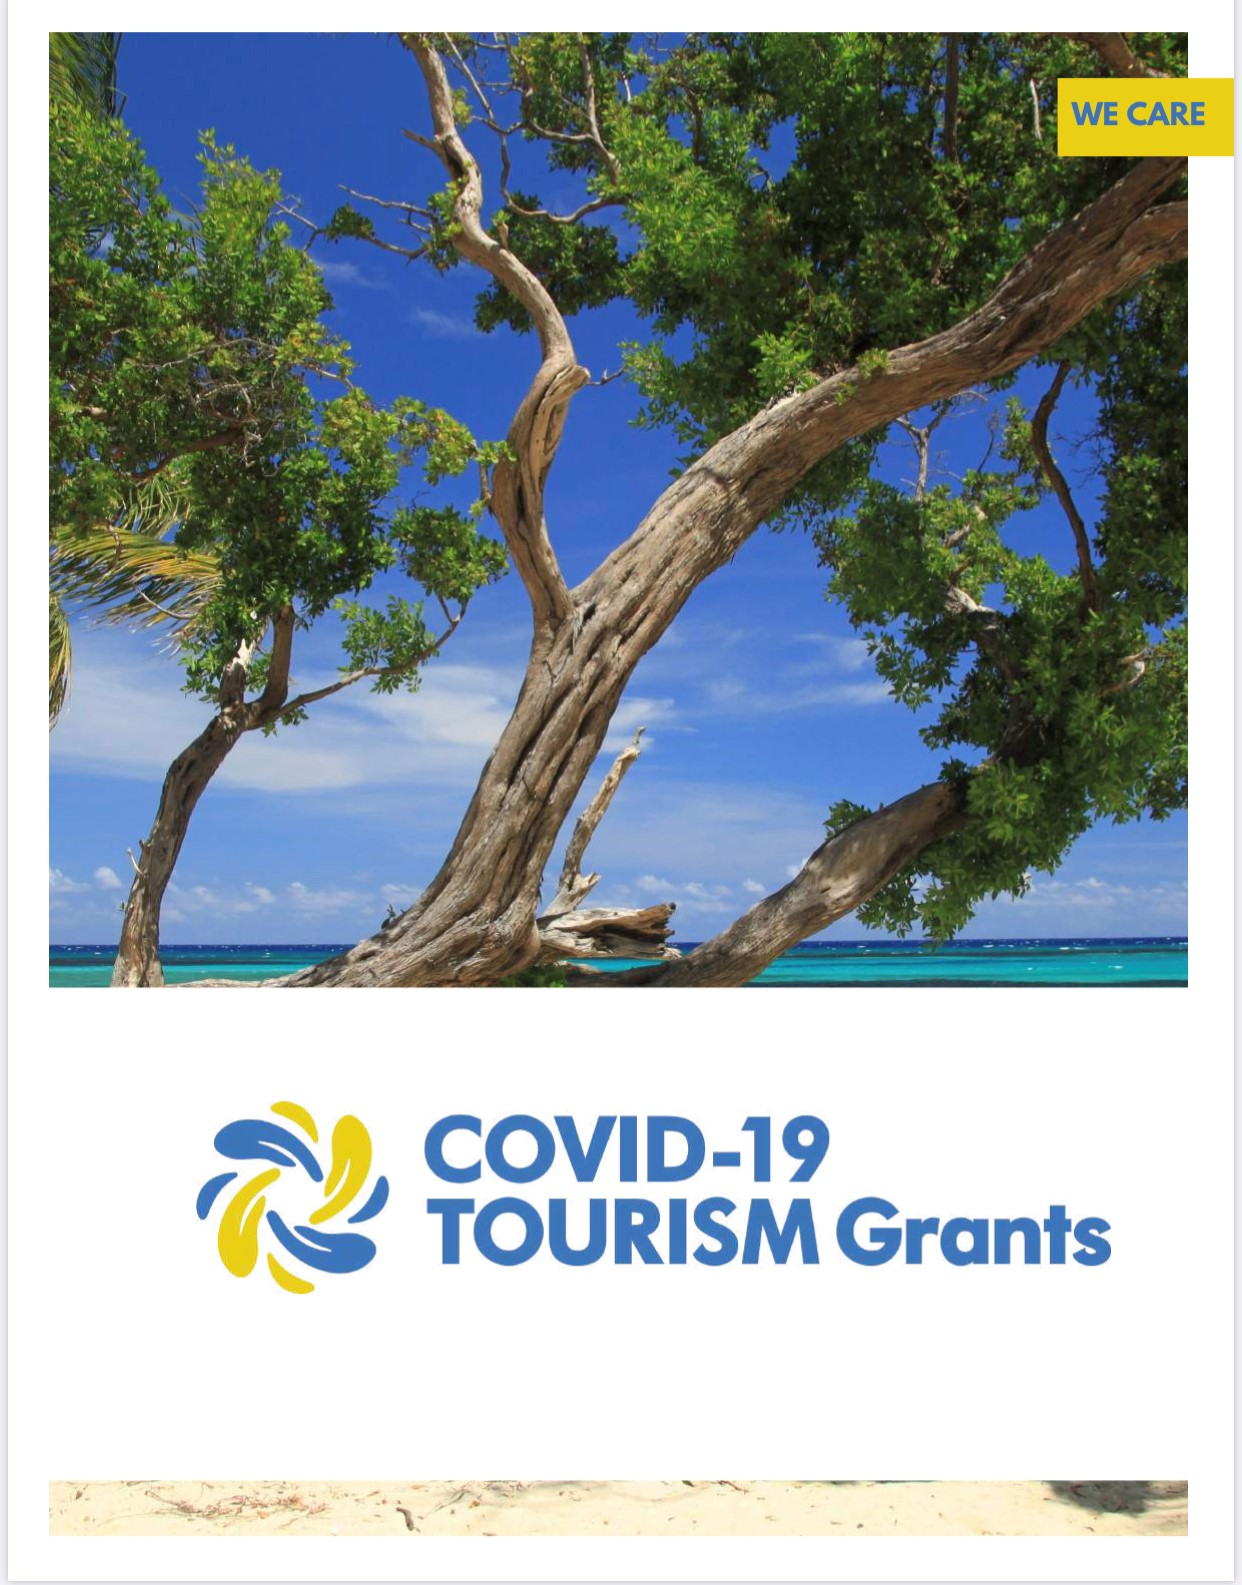 Tourism Grant via CARE Programme